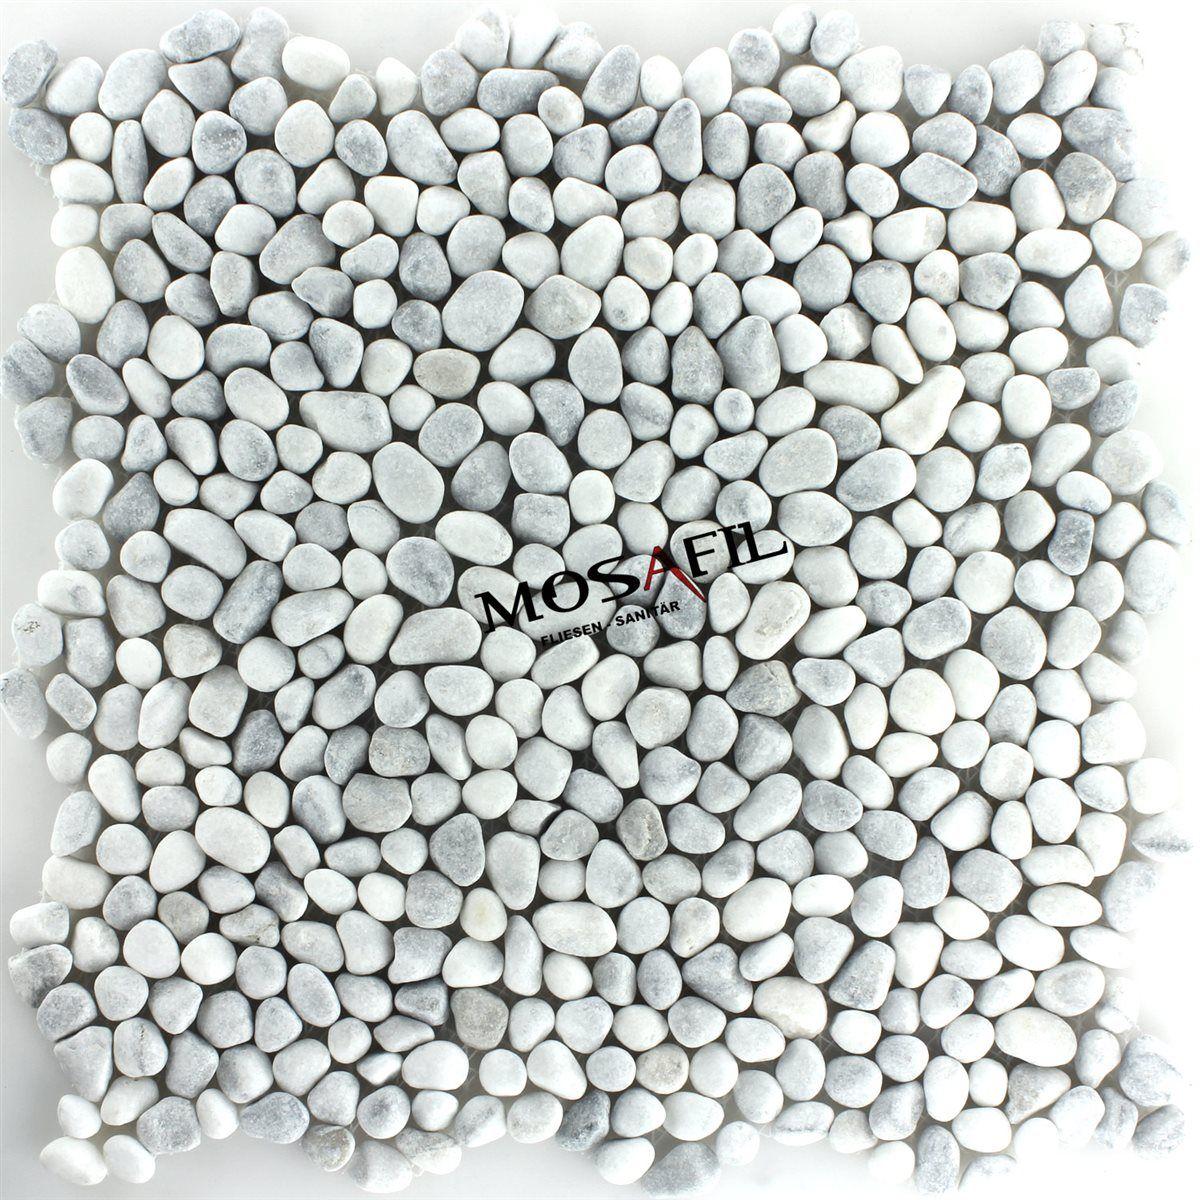 Flusskiesel Fliesen flusskiesel mini mosaik fliesen weiss grau pl78248m wohnen